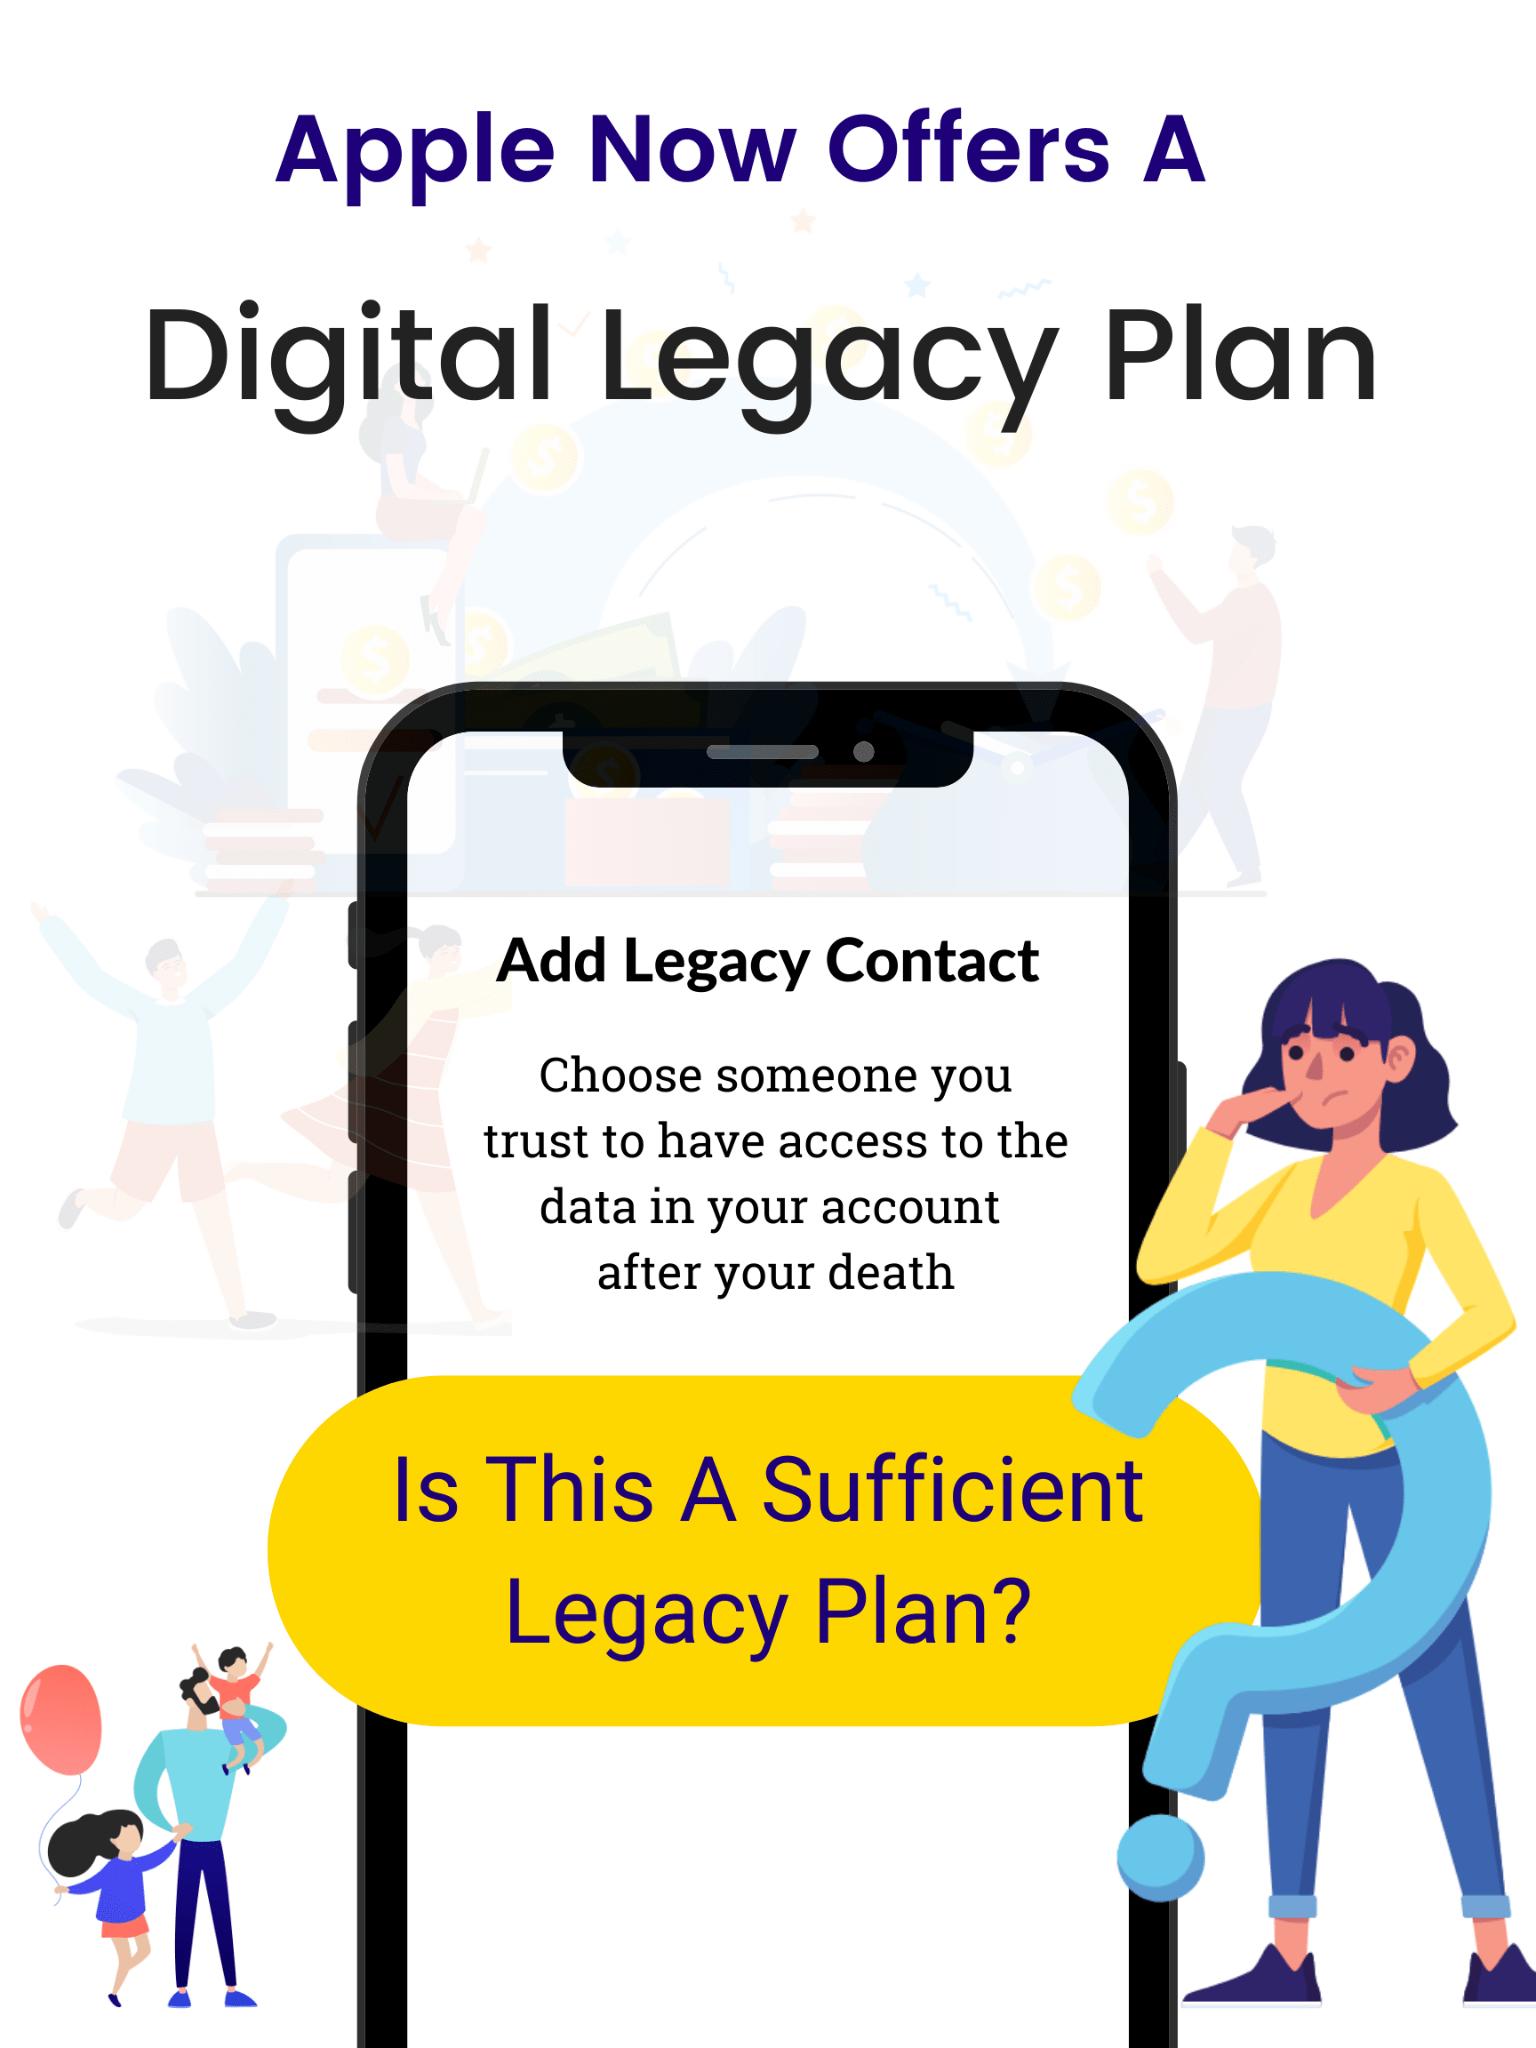 Apple's Digital Legacy Plan